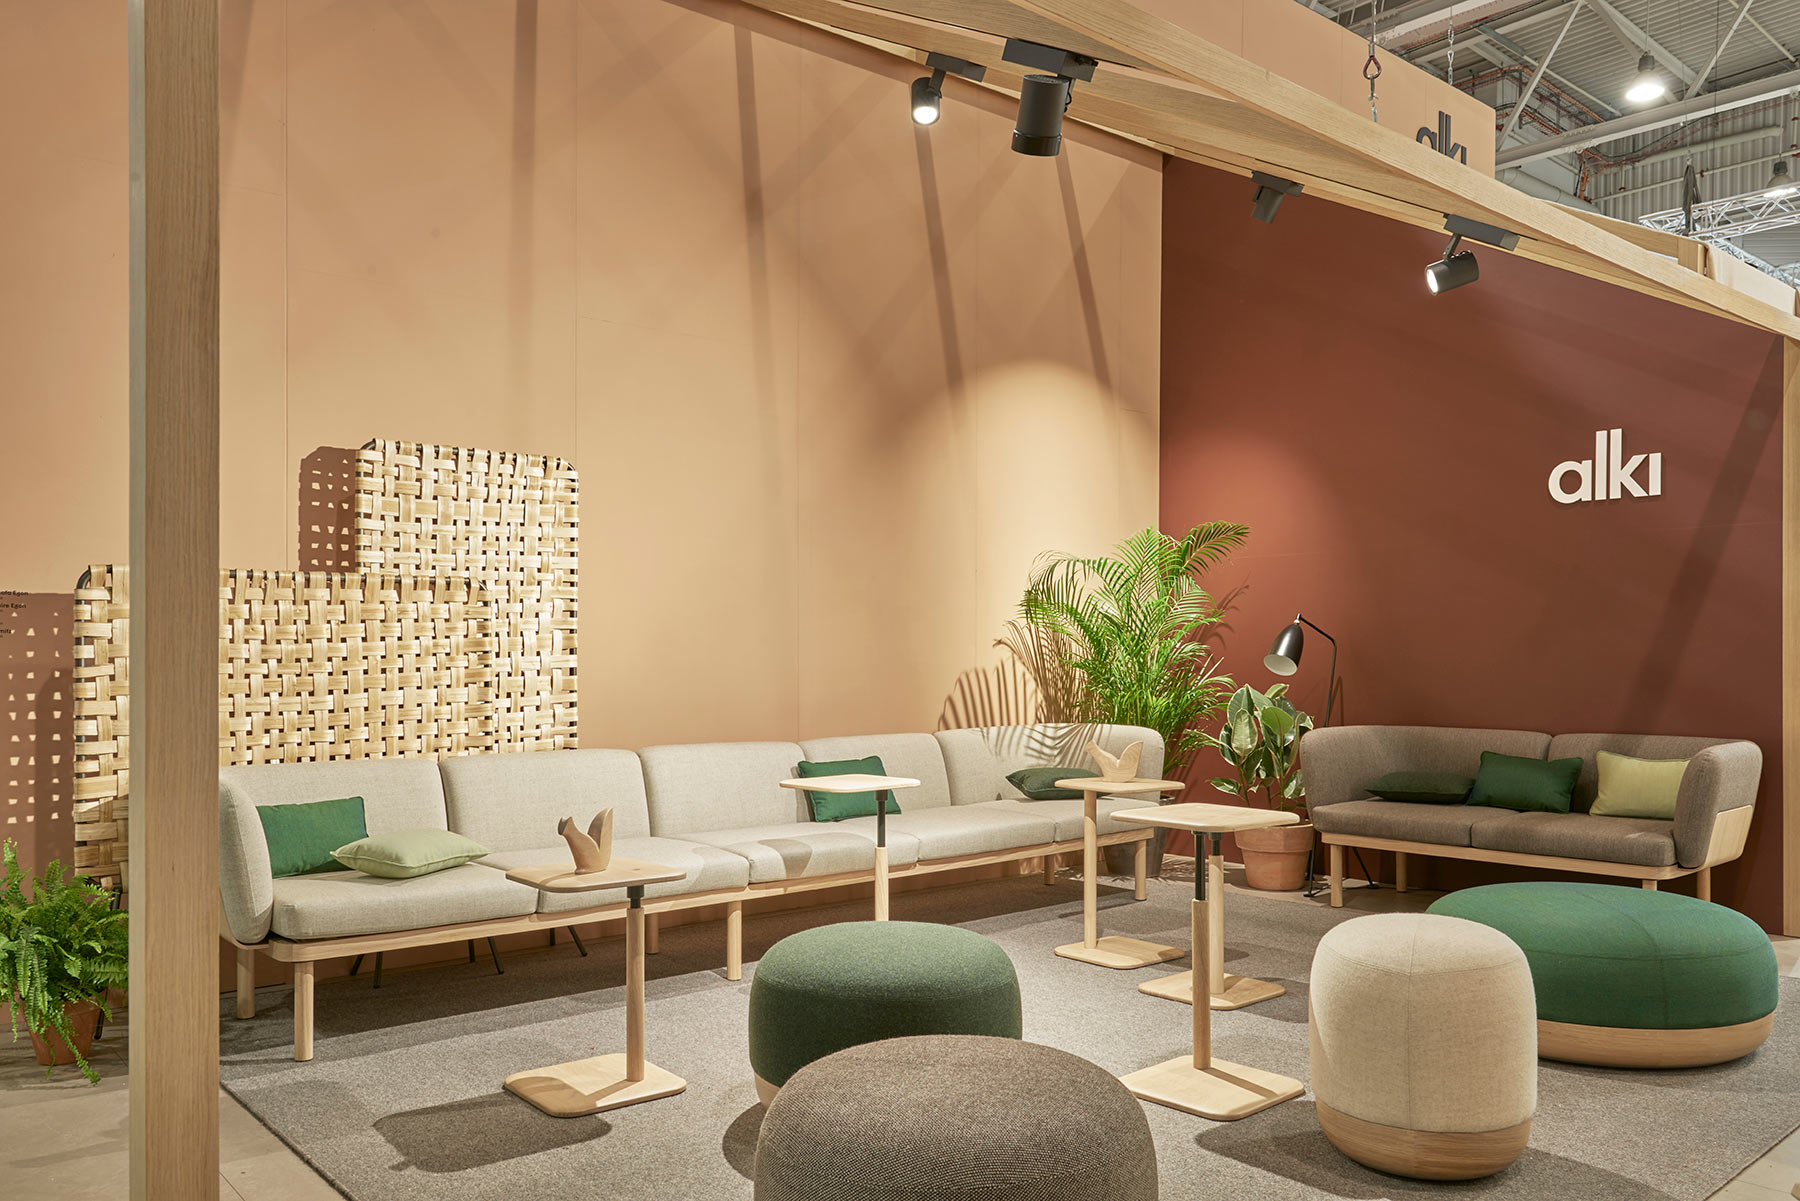 Egon-lounge-Collection-Alki